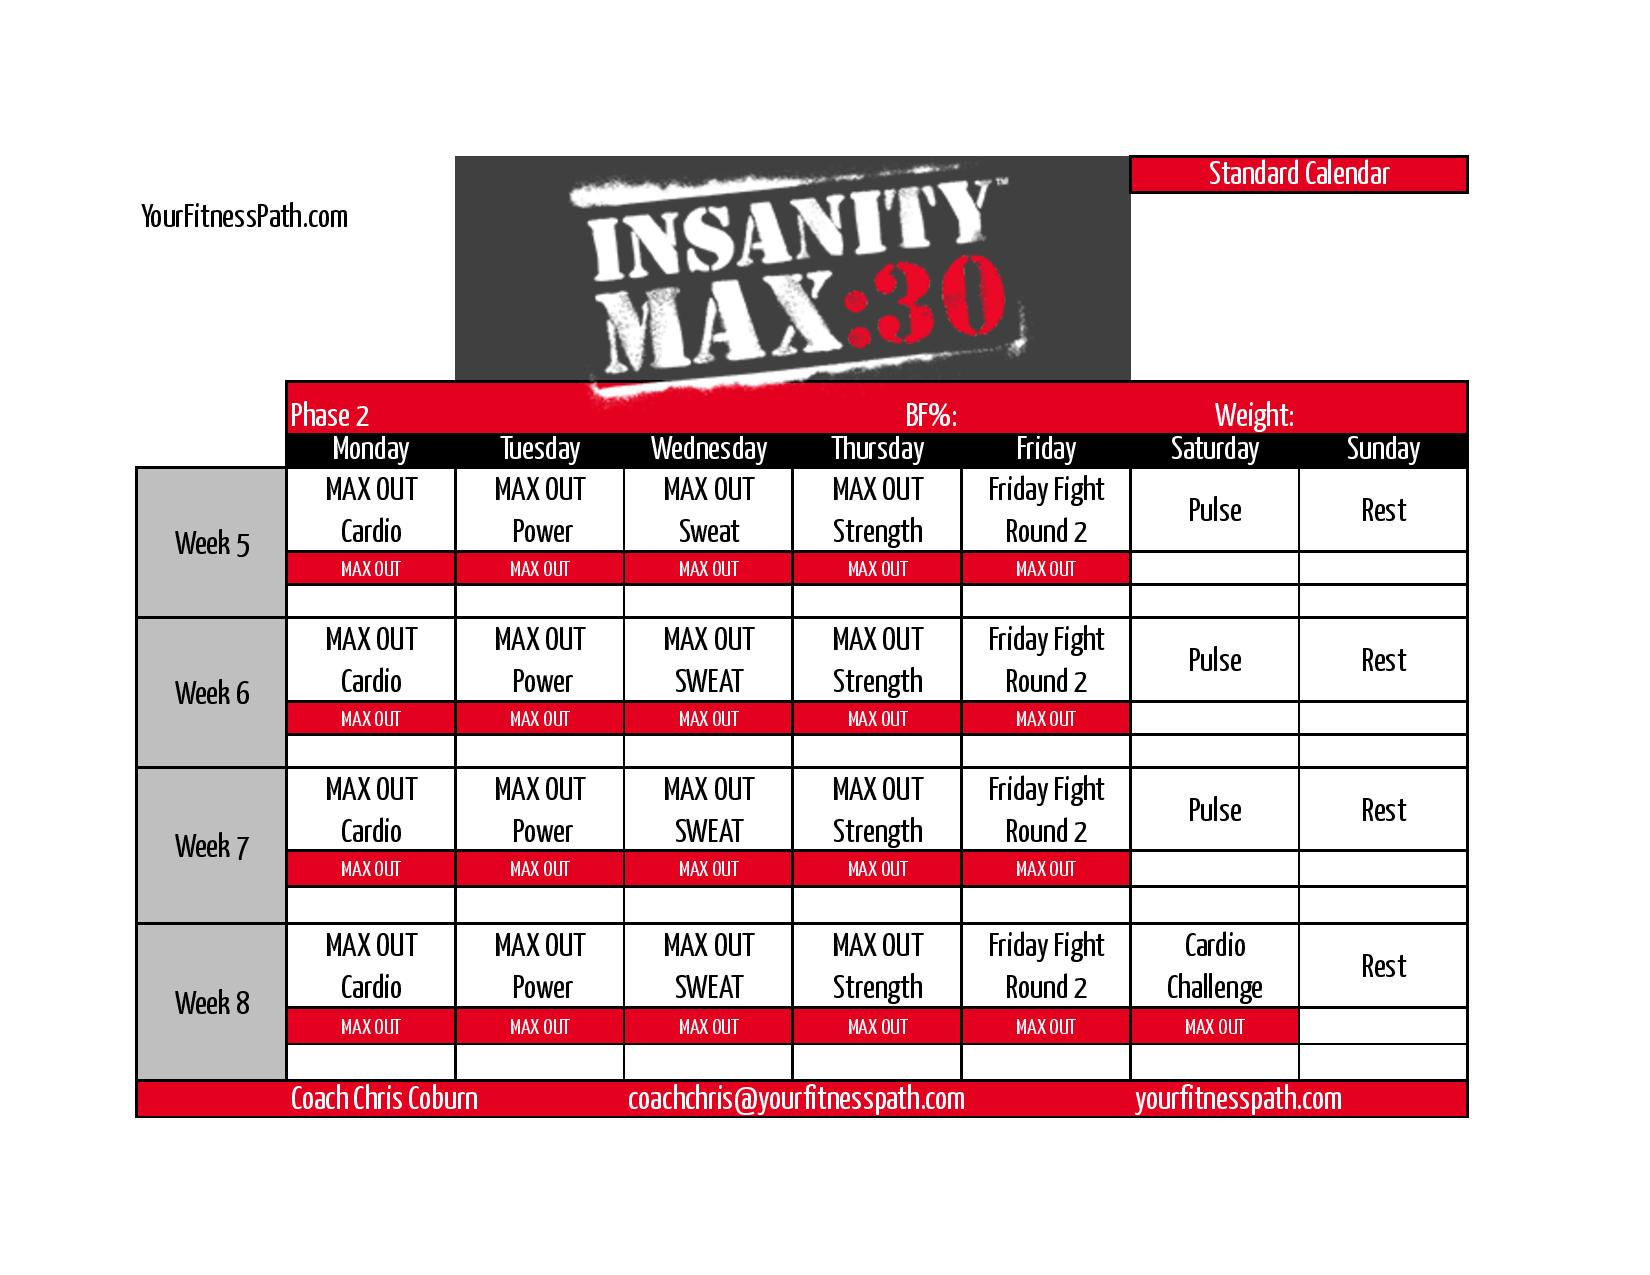 ✅Insanity Max 30 Calendar  You Calendars inside Insanity Max 30 Calendar Pdf